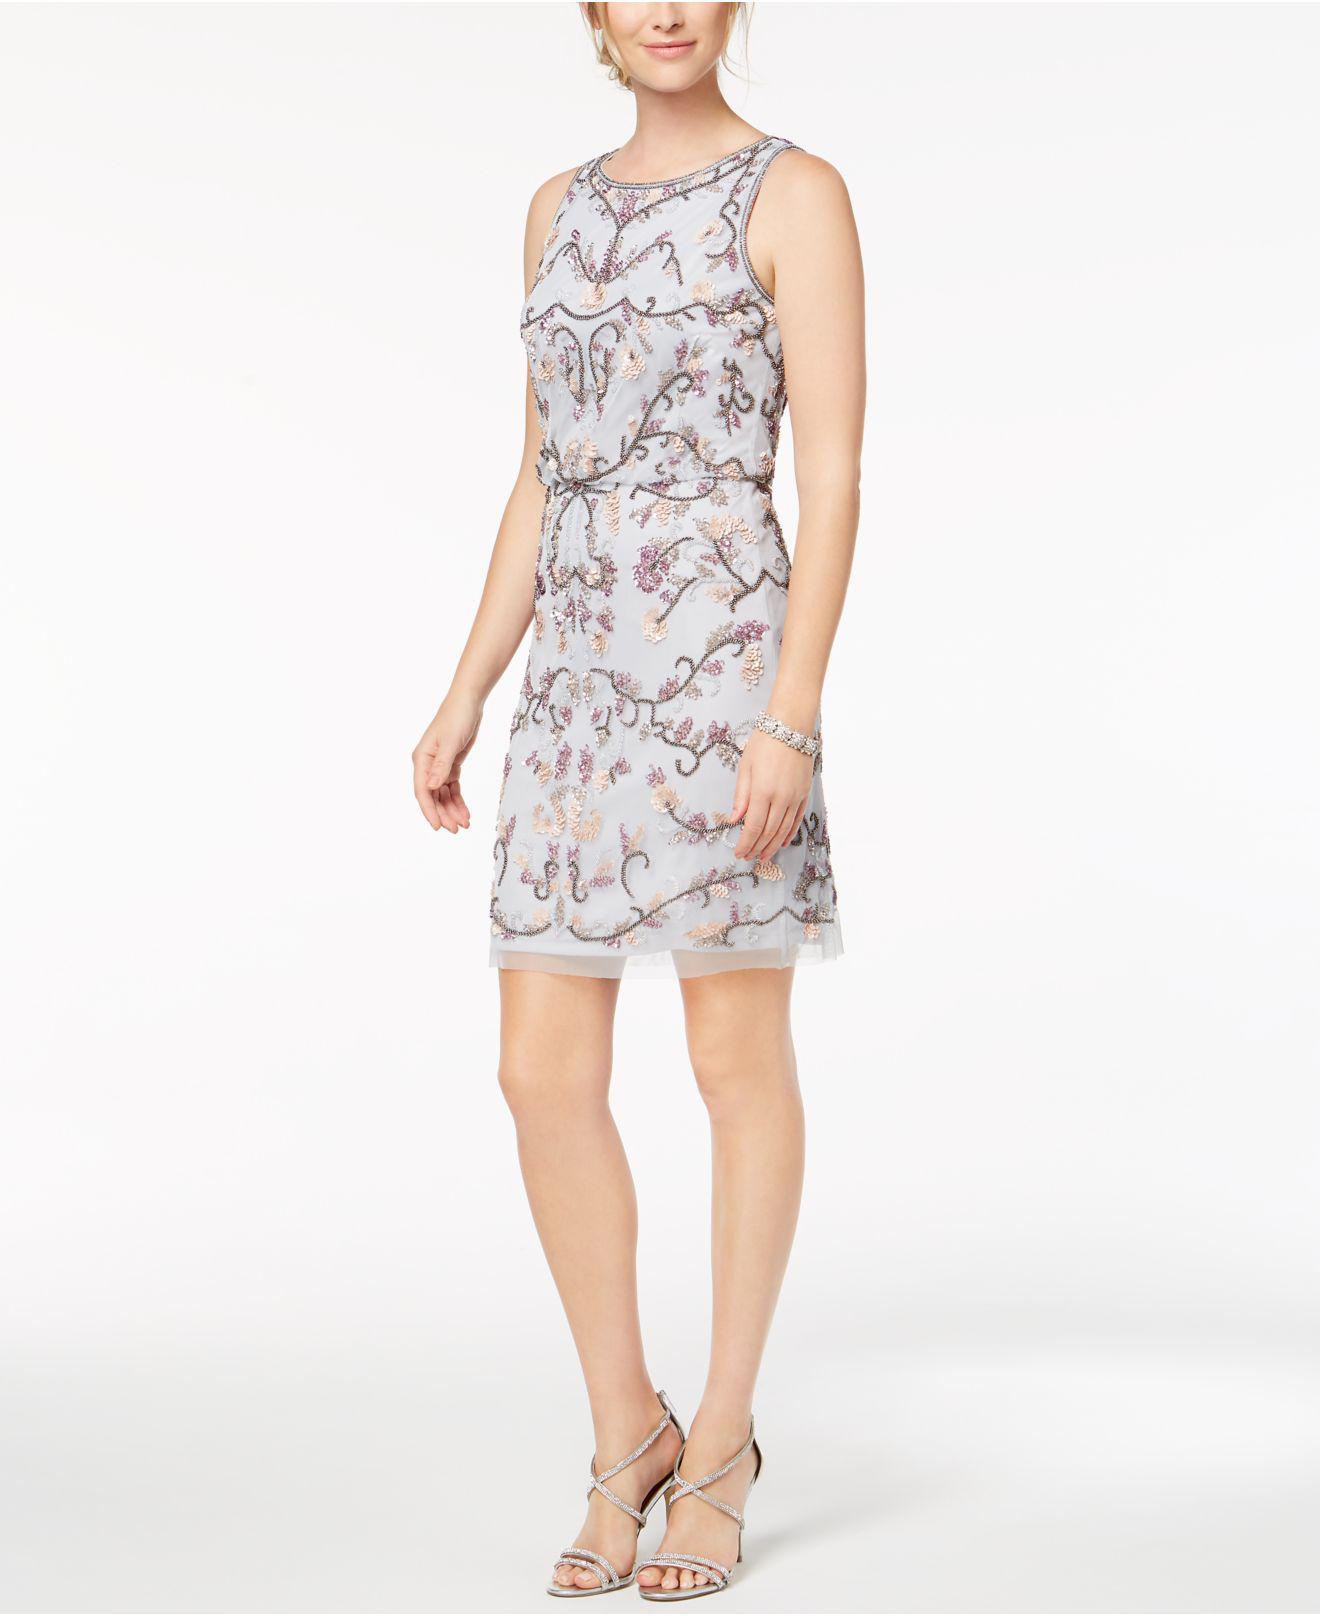 6d6b7ceff7e Adrianna Papell. Women s Petite Sleeveless Beaded Blouson Dress